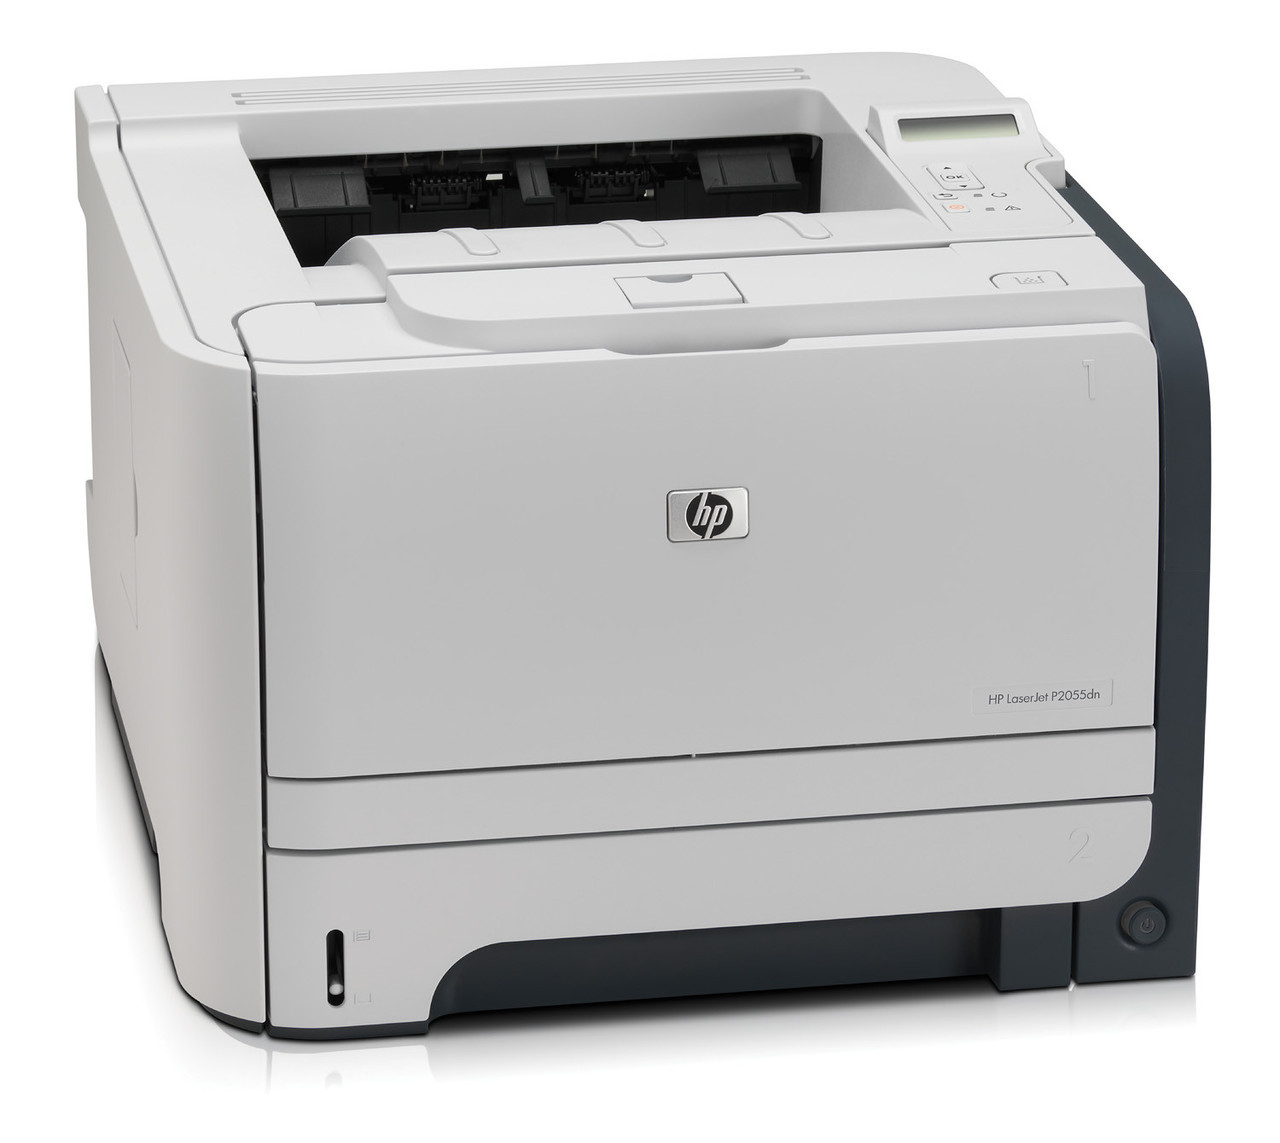 HP Laserjet P2055D - CE457AR - 2035 HP Printer for sale